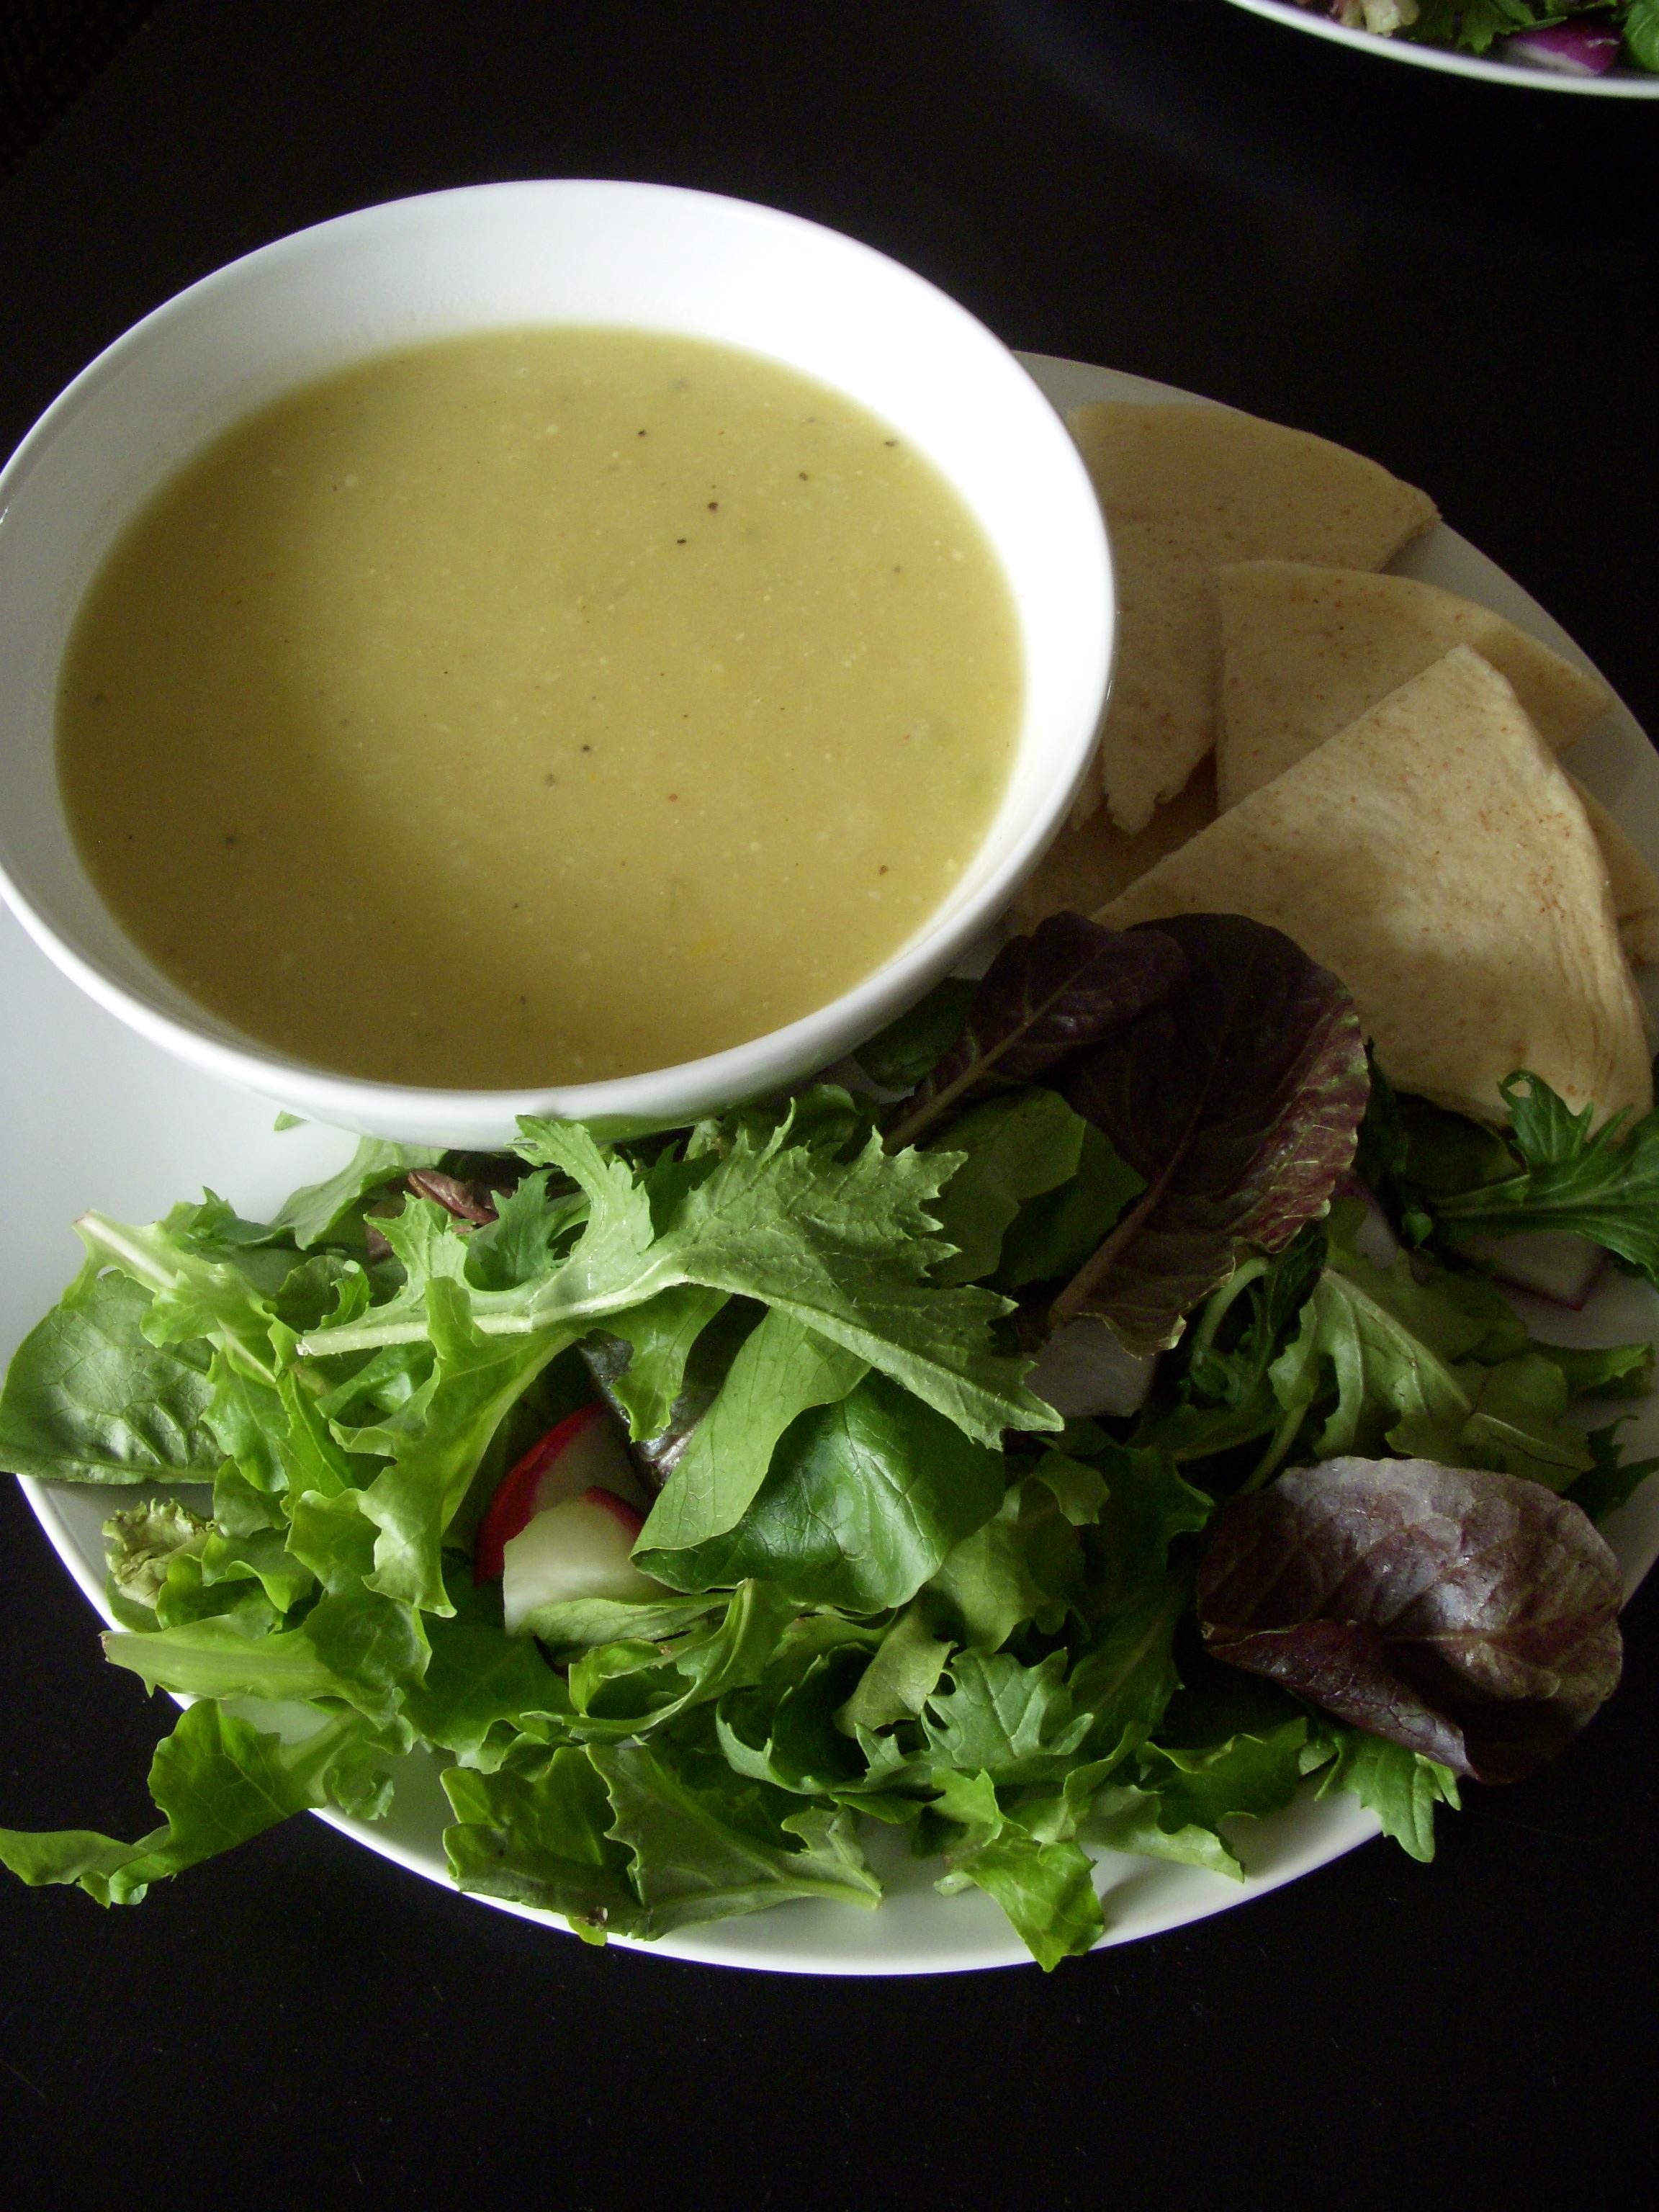 Zucchini and Squash Soup